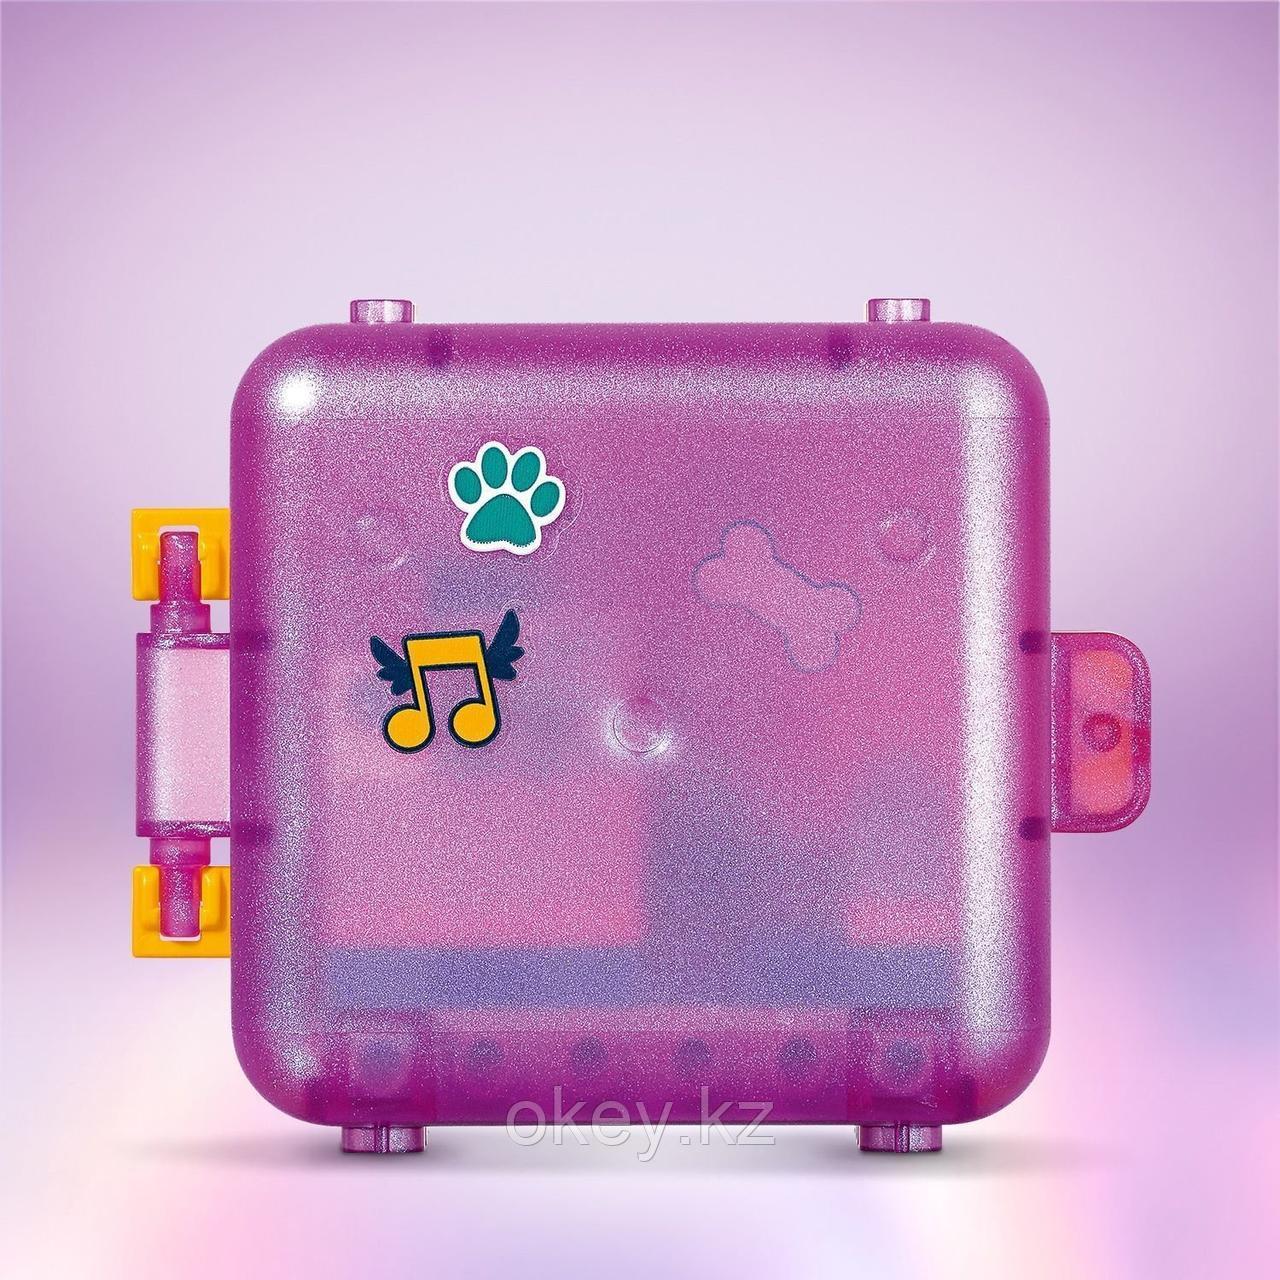 LEGO Friends: Игровая шкатулка Покупки Андреа 41405 - фото 5